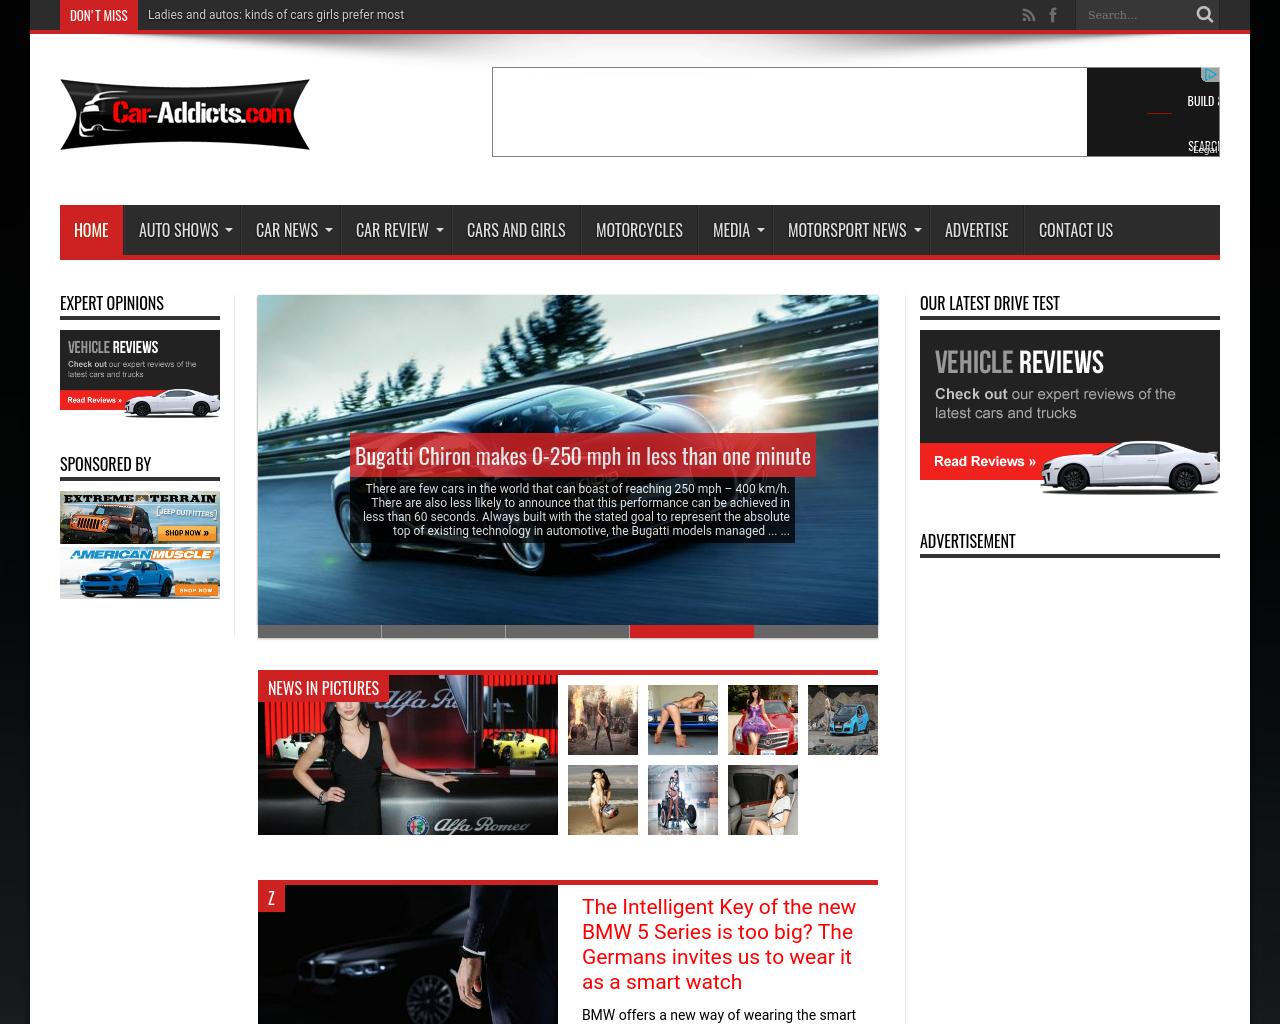 Car-addicts-Advertising-Reviews-Pricing